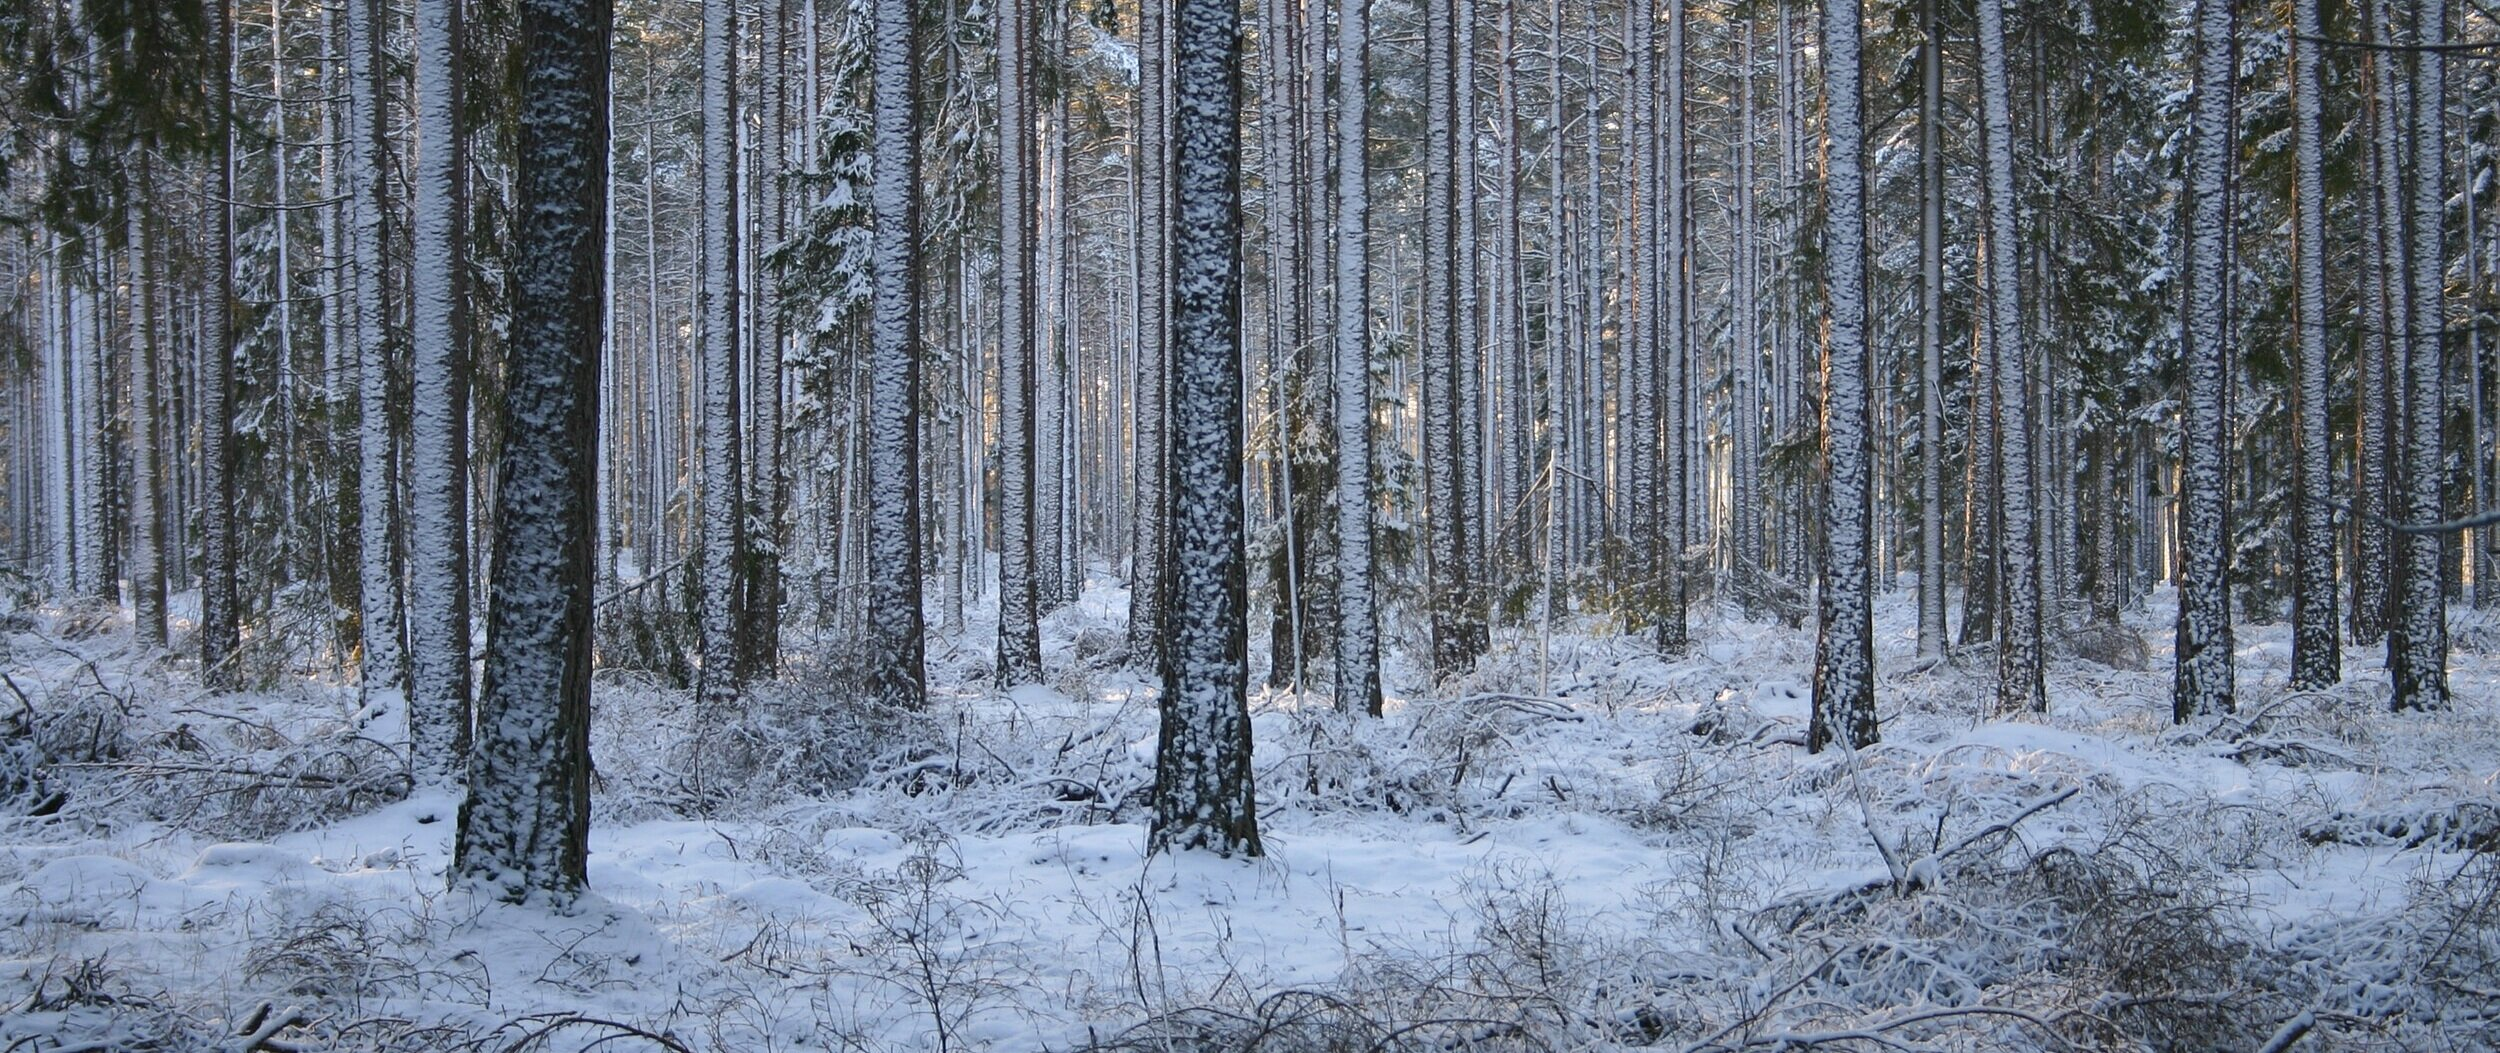 forest+in+winter+%281%29.jpg